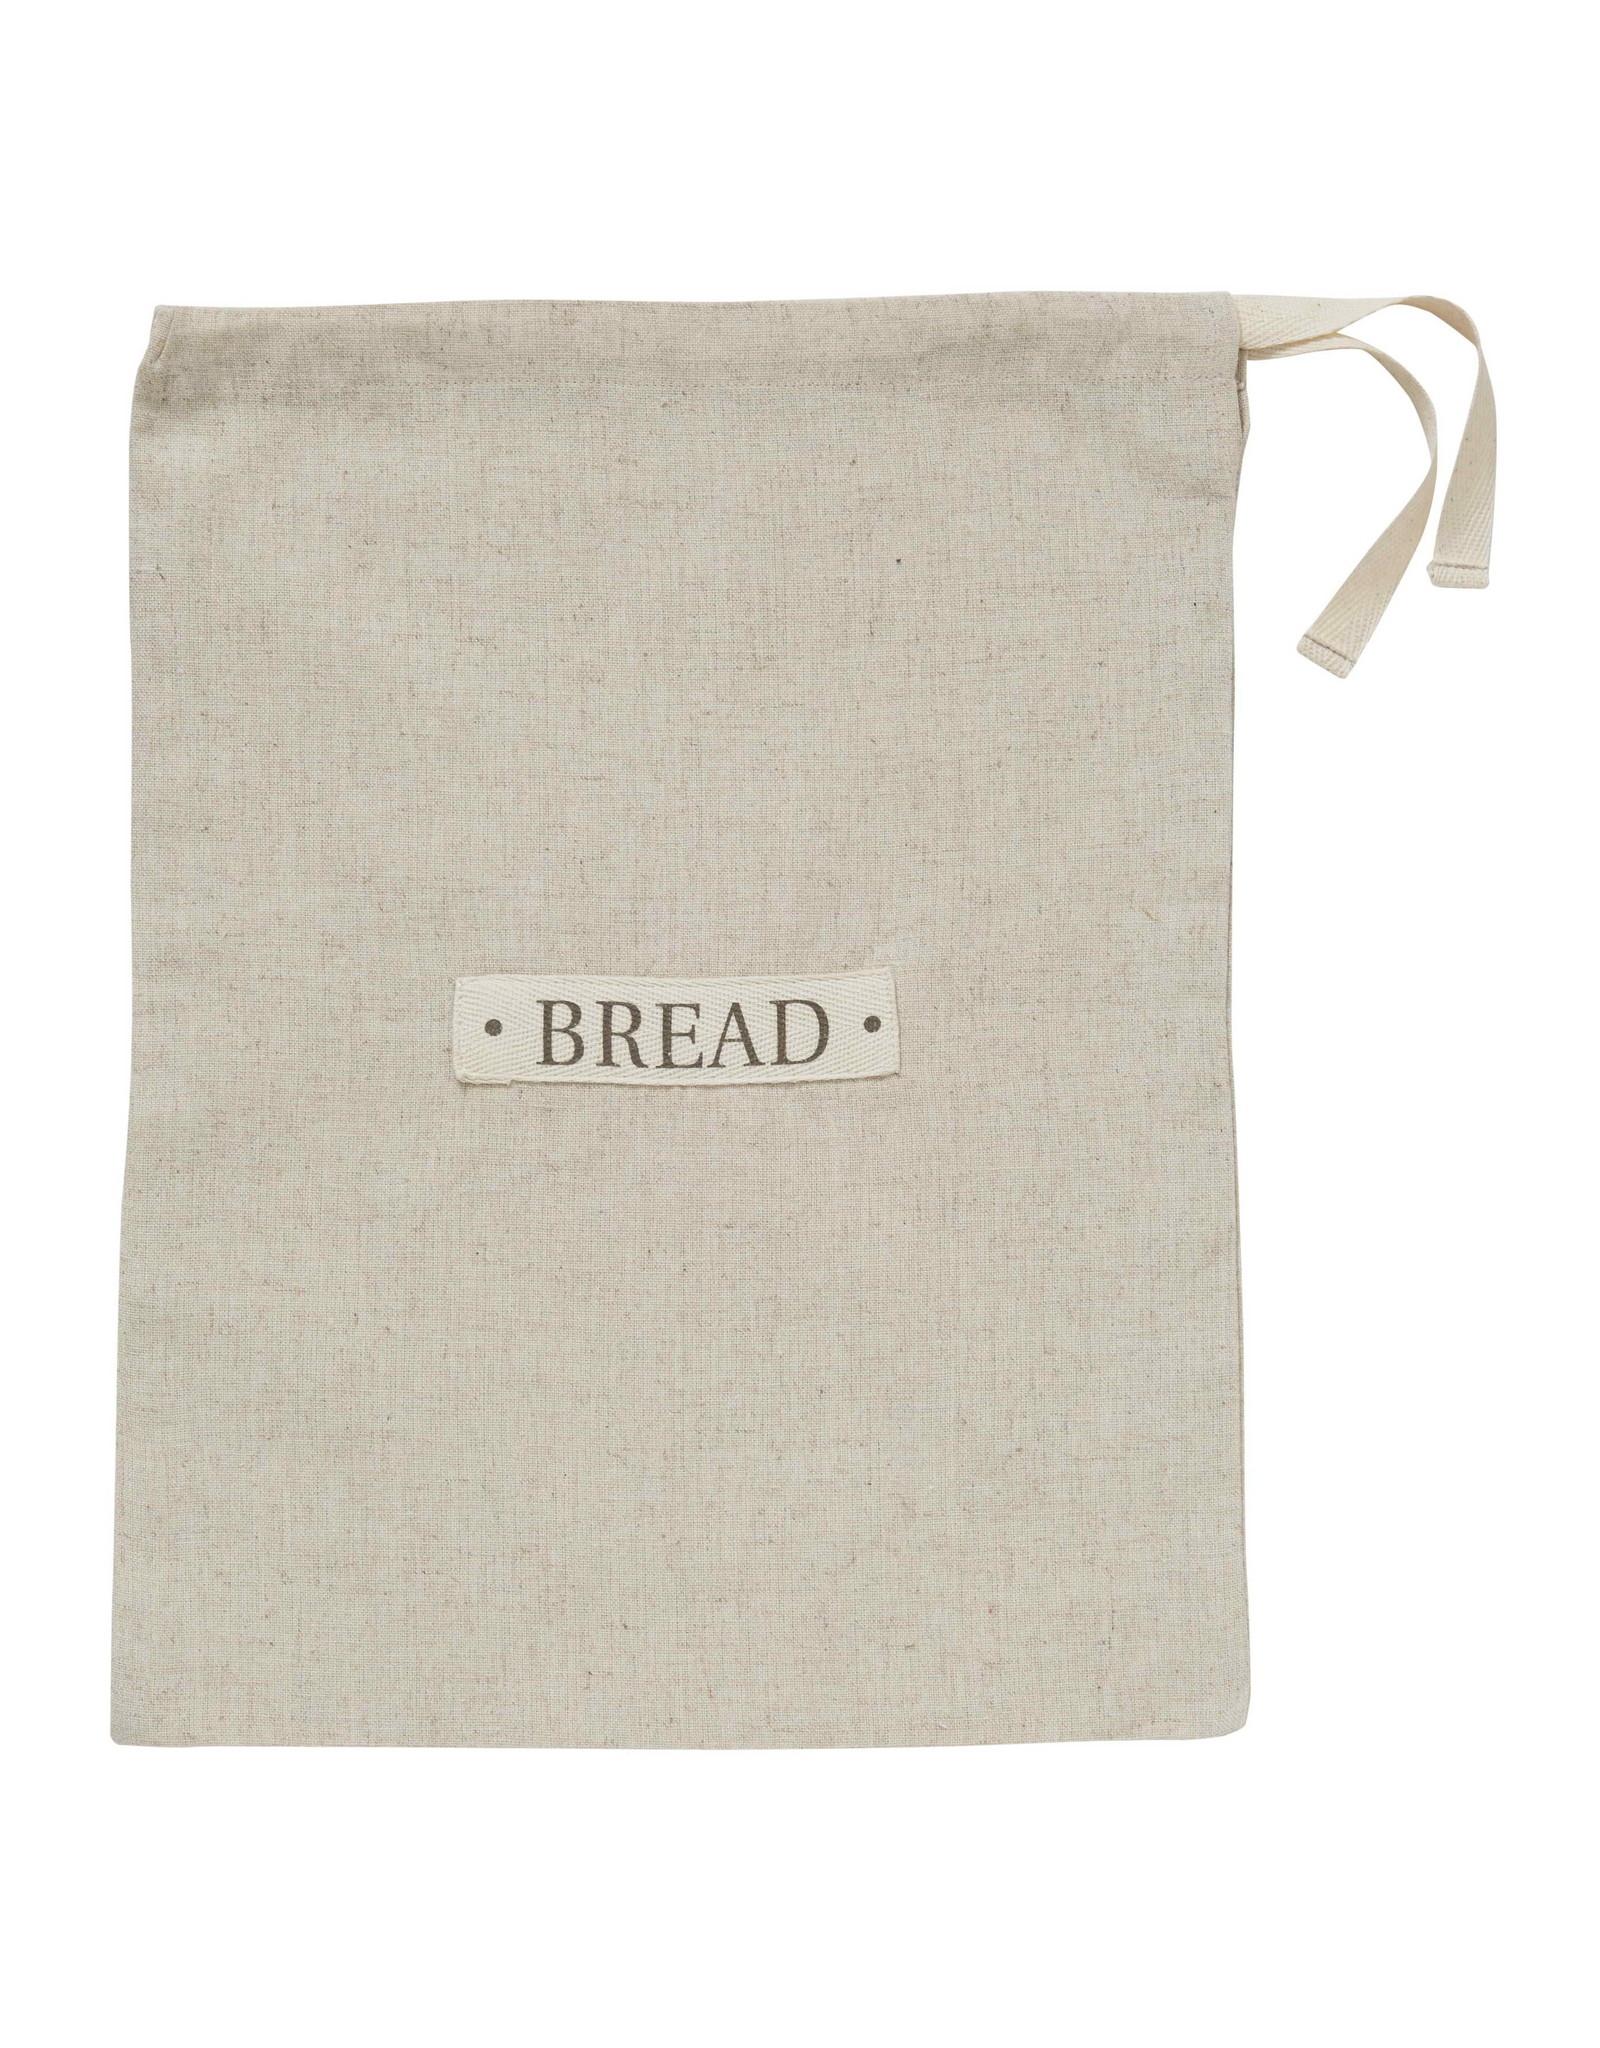 Stephanie Alexander Artisan Loaf Bread Bag 30x40cm